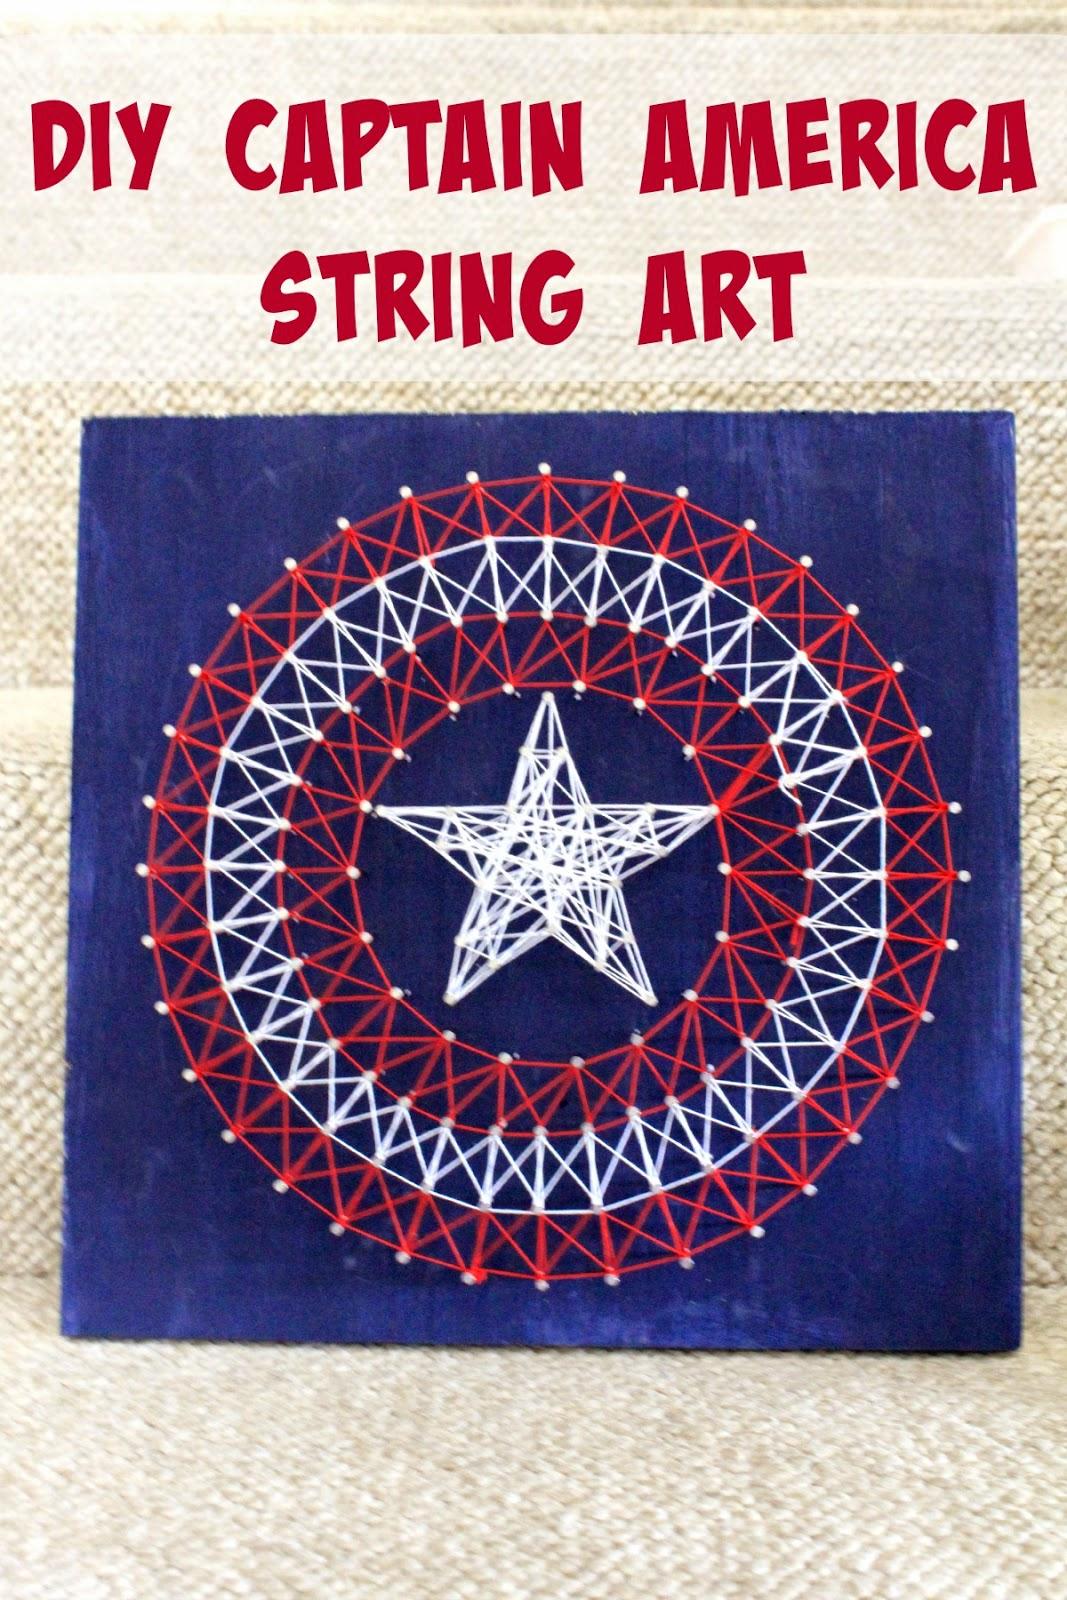 DIY Avengers Captain America String Art  #FandangoFamily #ad